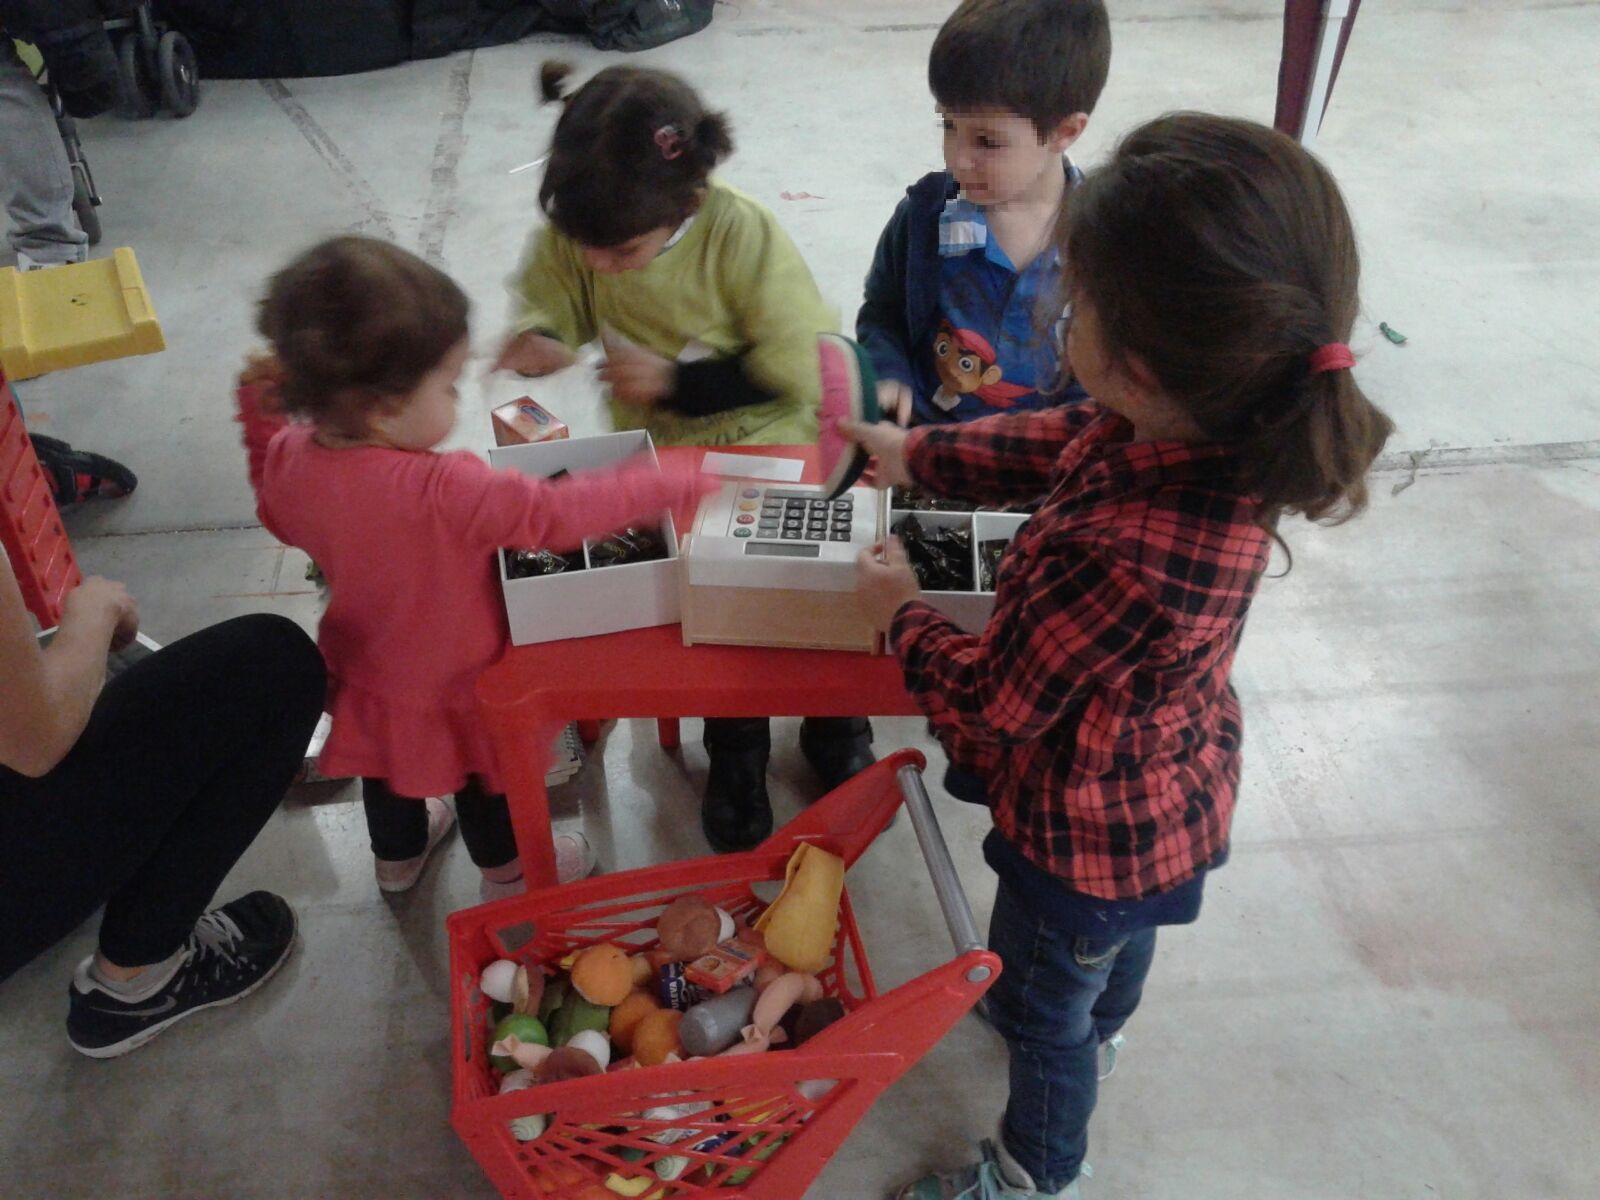 dia-universal-de-la-infancia-fundtrafic-bankia-15